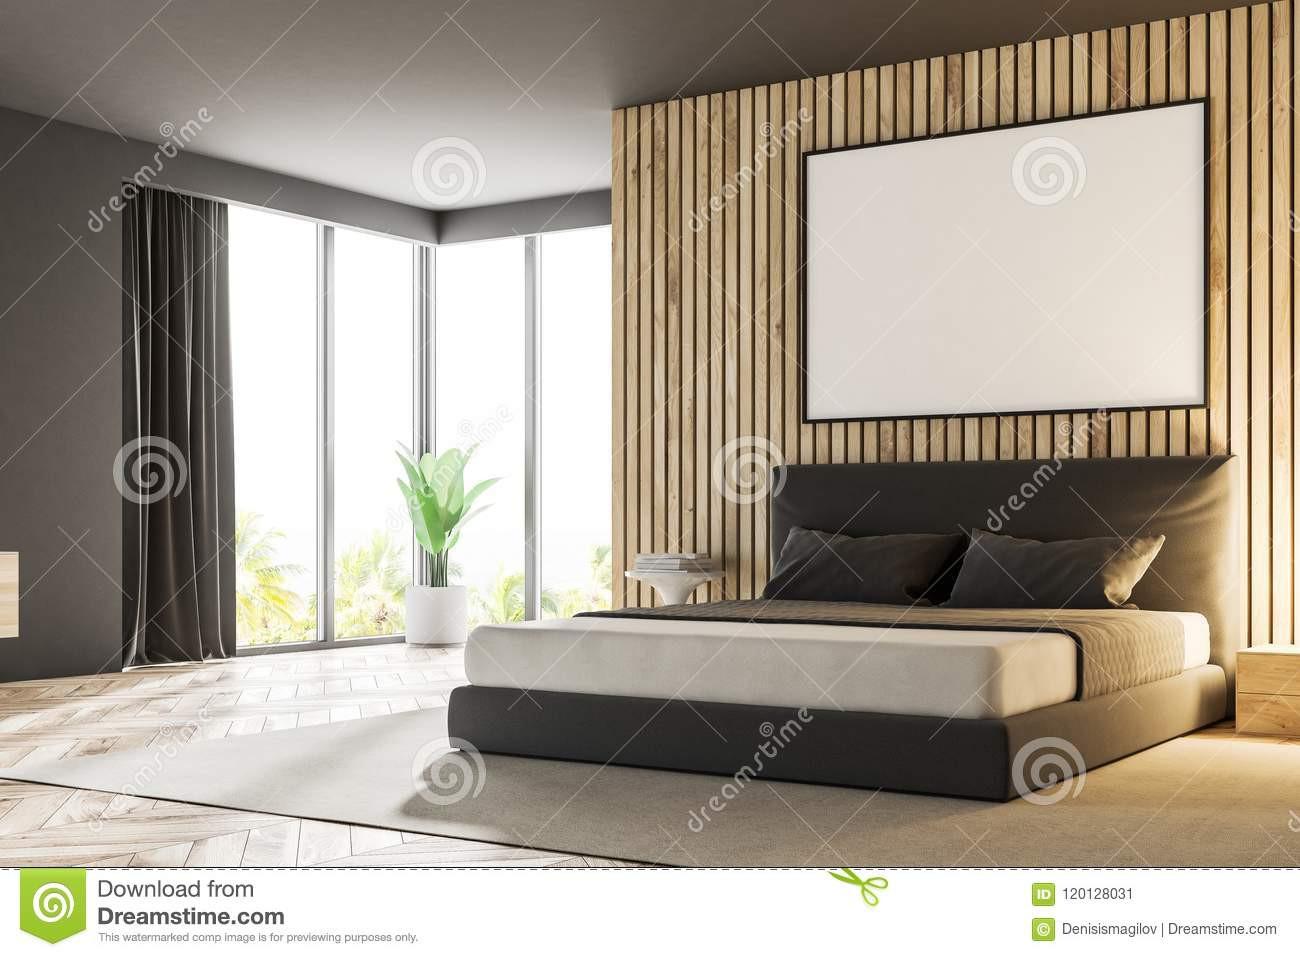 gray hardwood floors bedroom of wood master bedroom corner poster stock illustration illustration regarding wood master bedroom corner poster